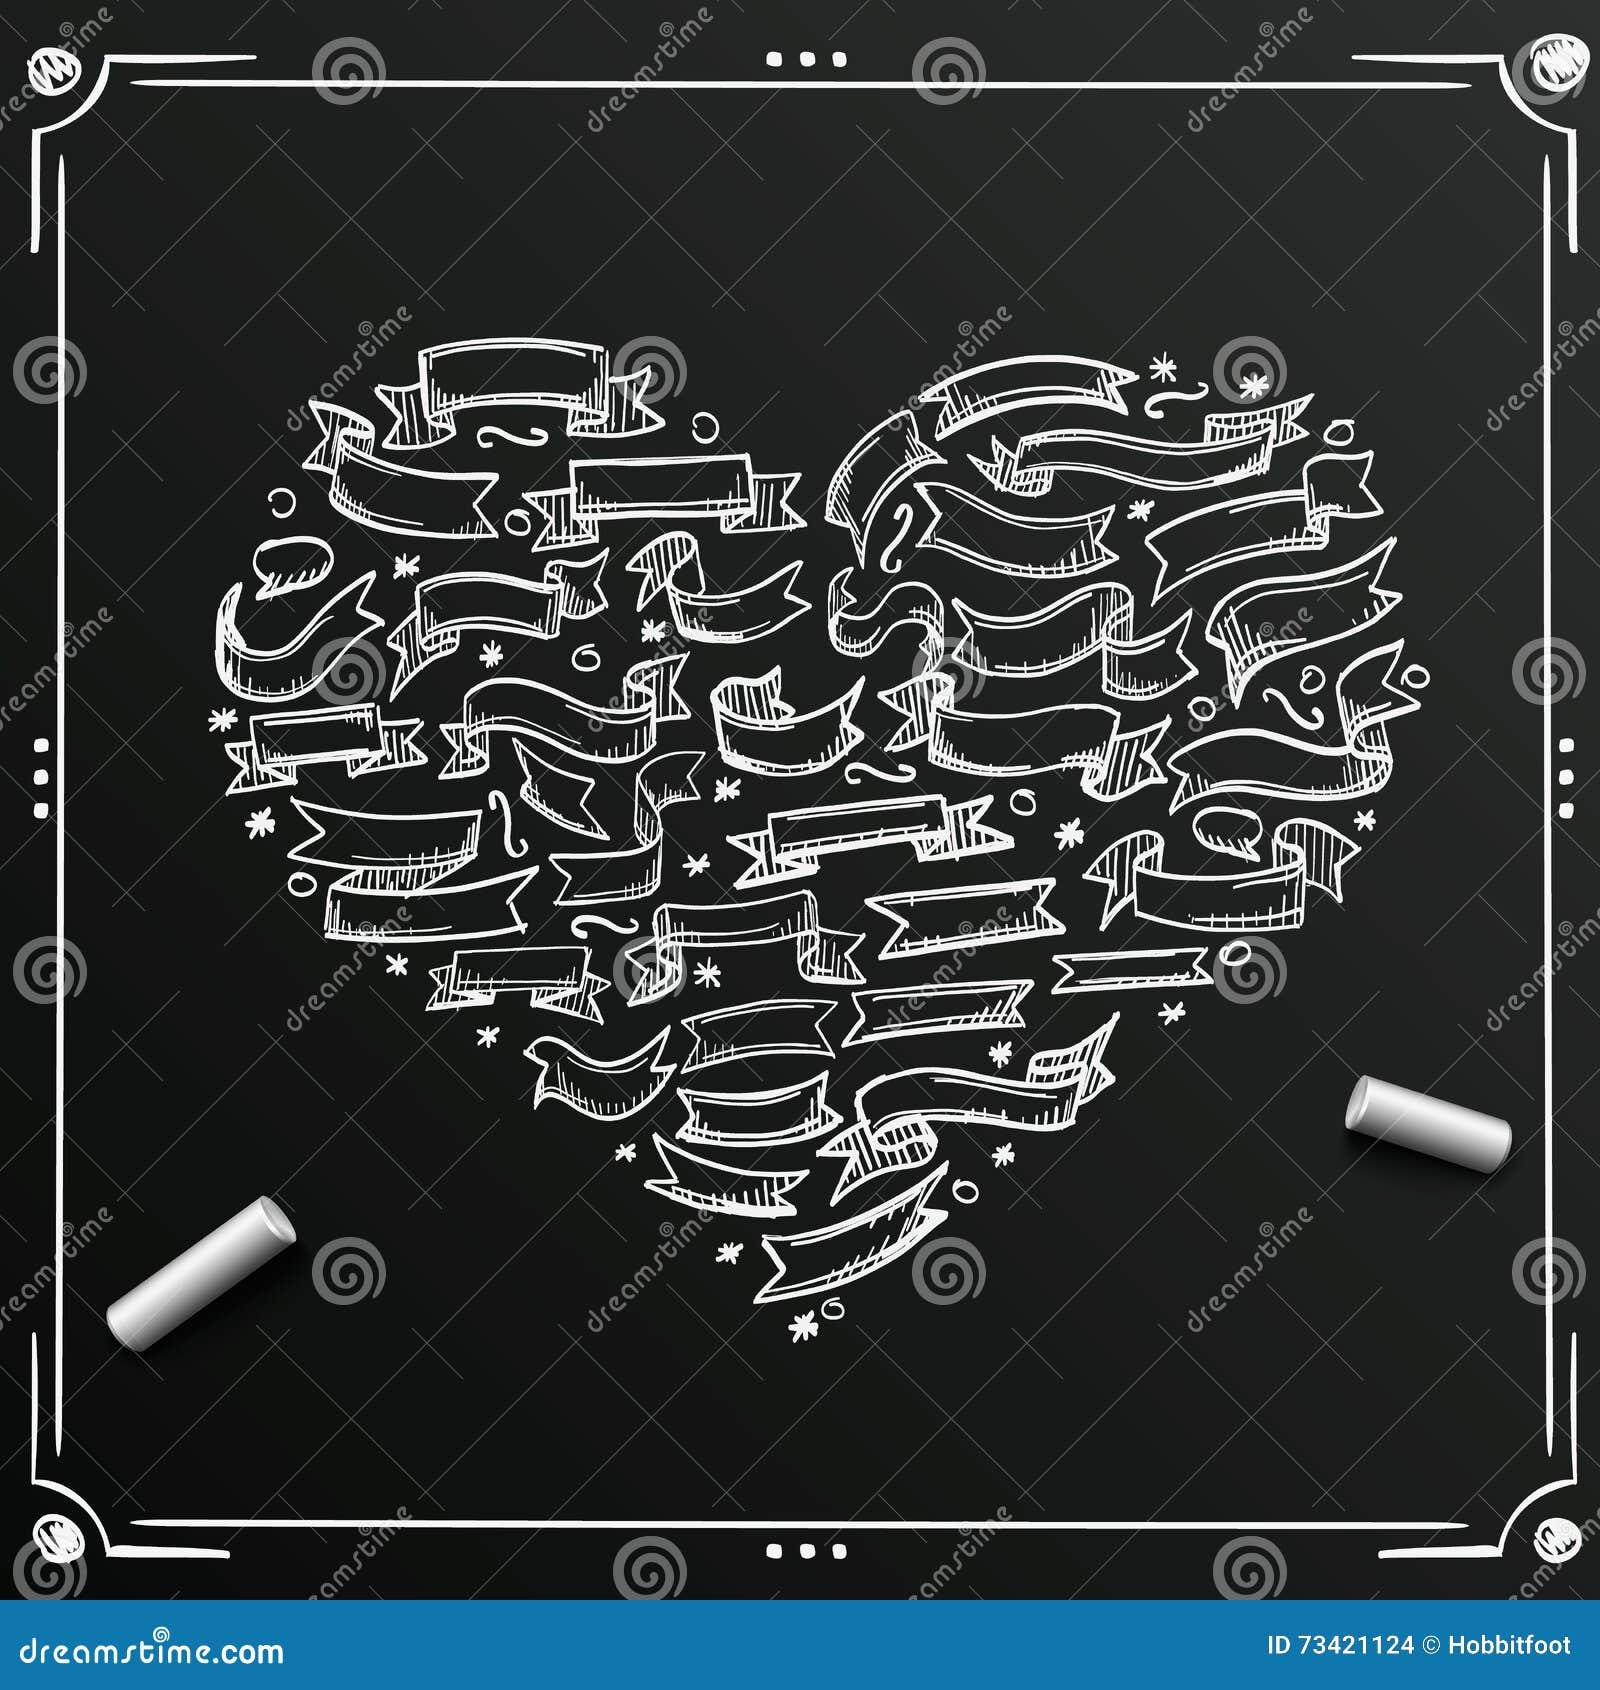 Chalkboard Sketch Of Hand Drawn Ribbon Heart Template Design Element Vector Vintage